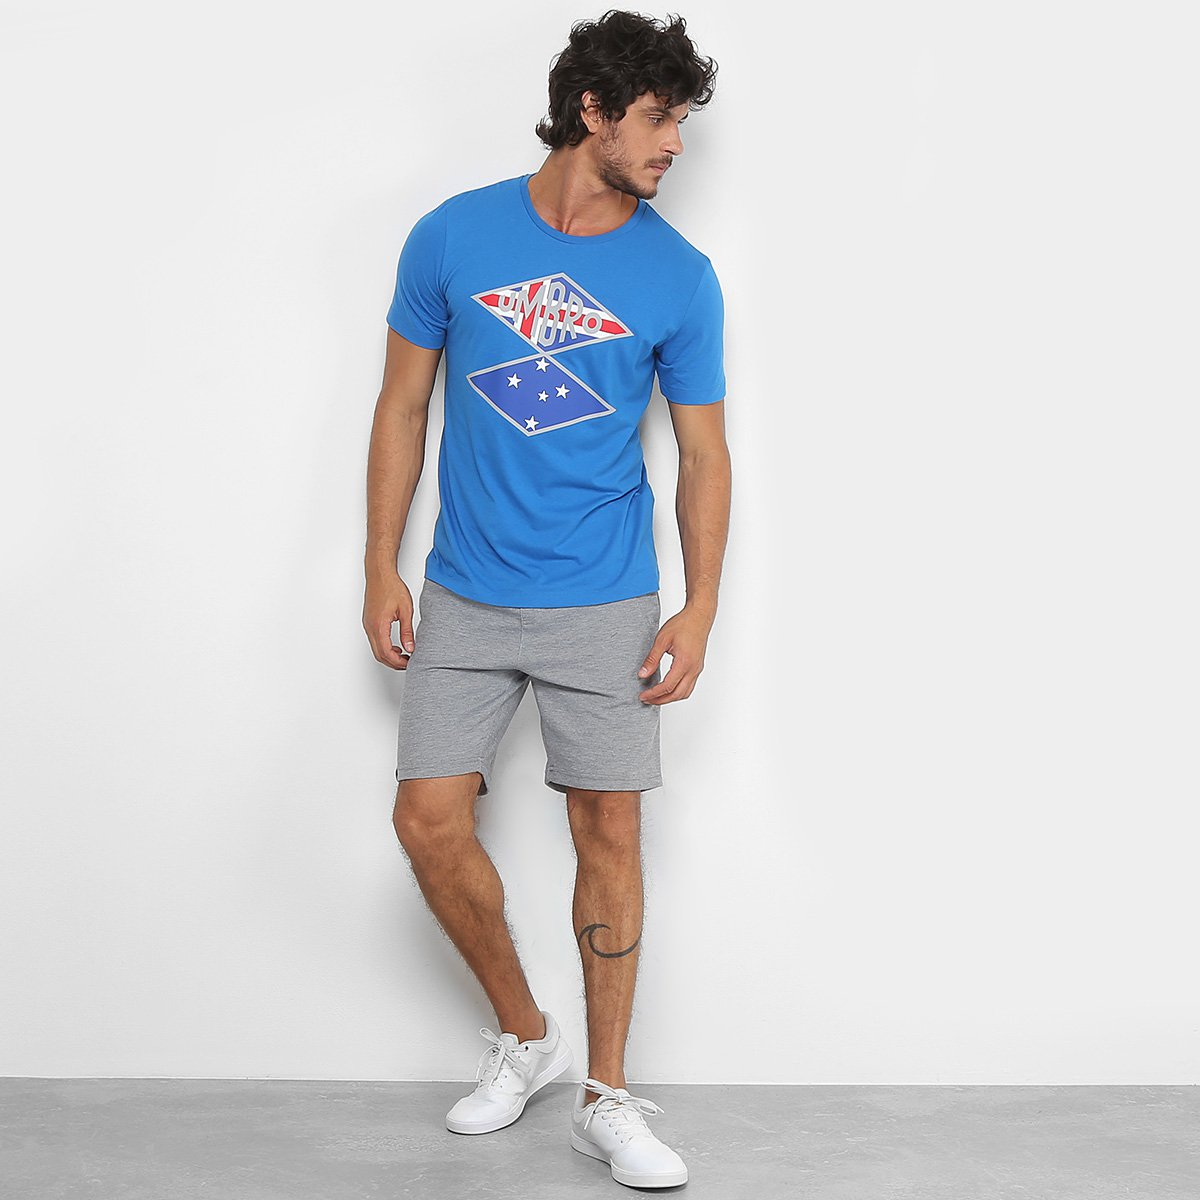 Camiseta Cruzeiro Flag Nations Torcedor Umbro Masculina - Azul ... d6d15786beb05